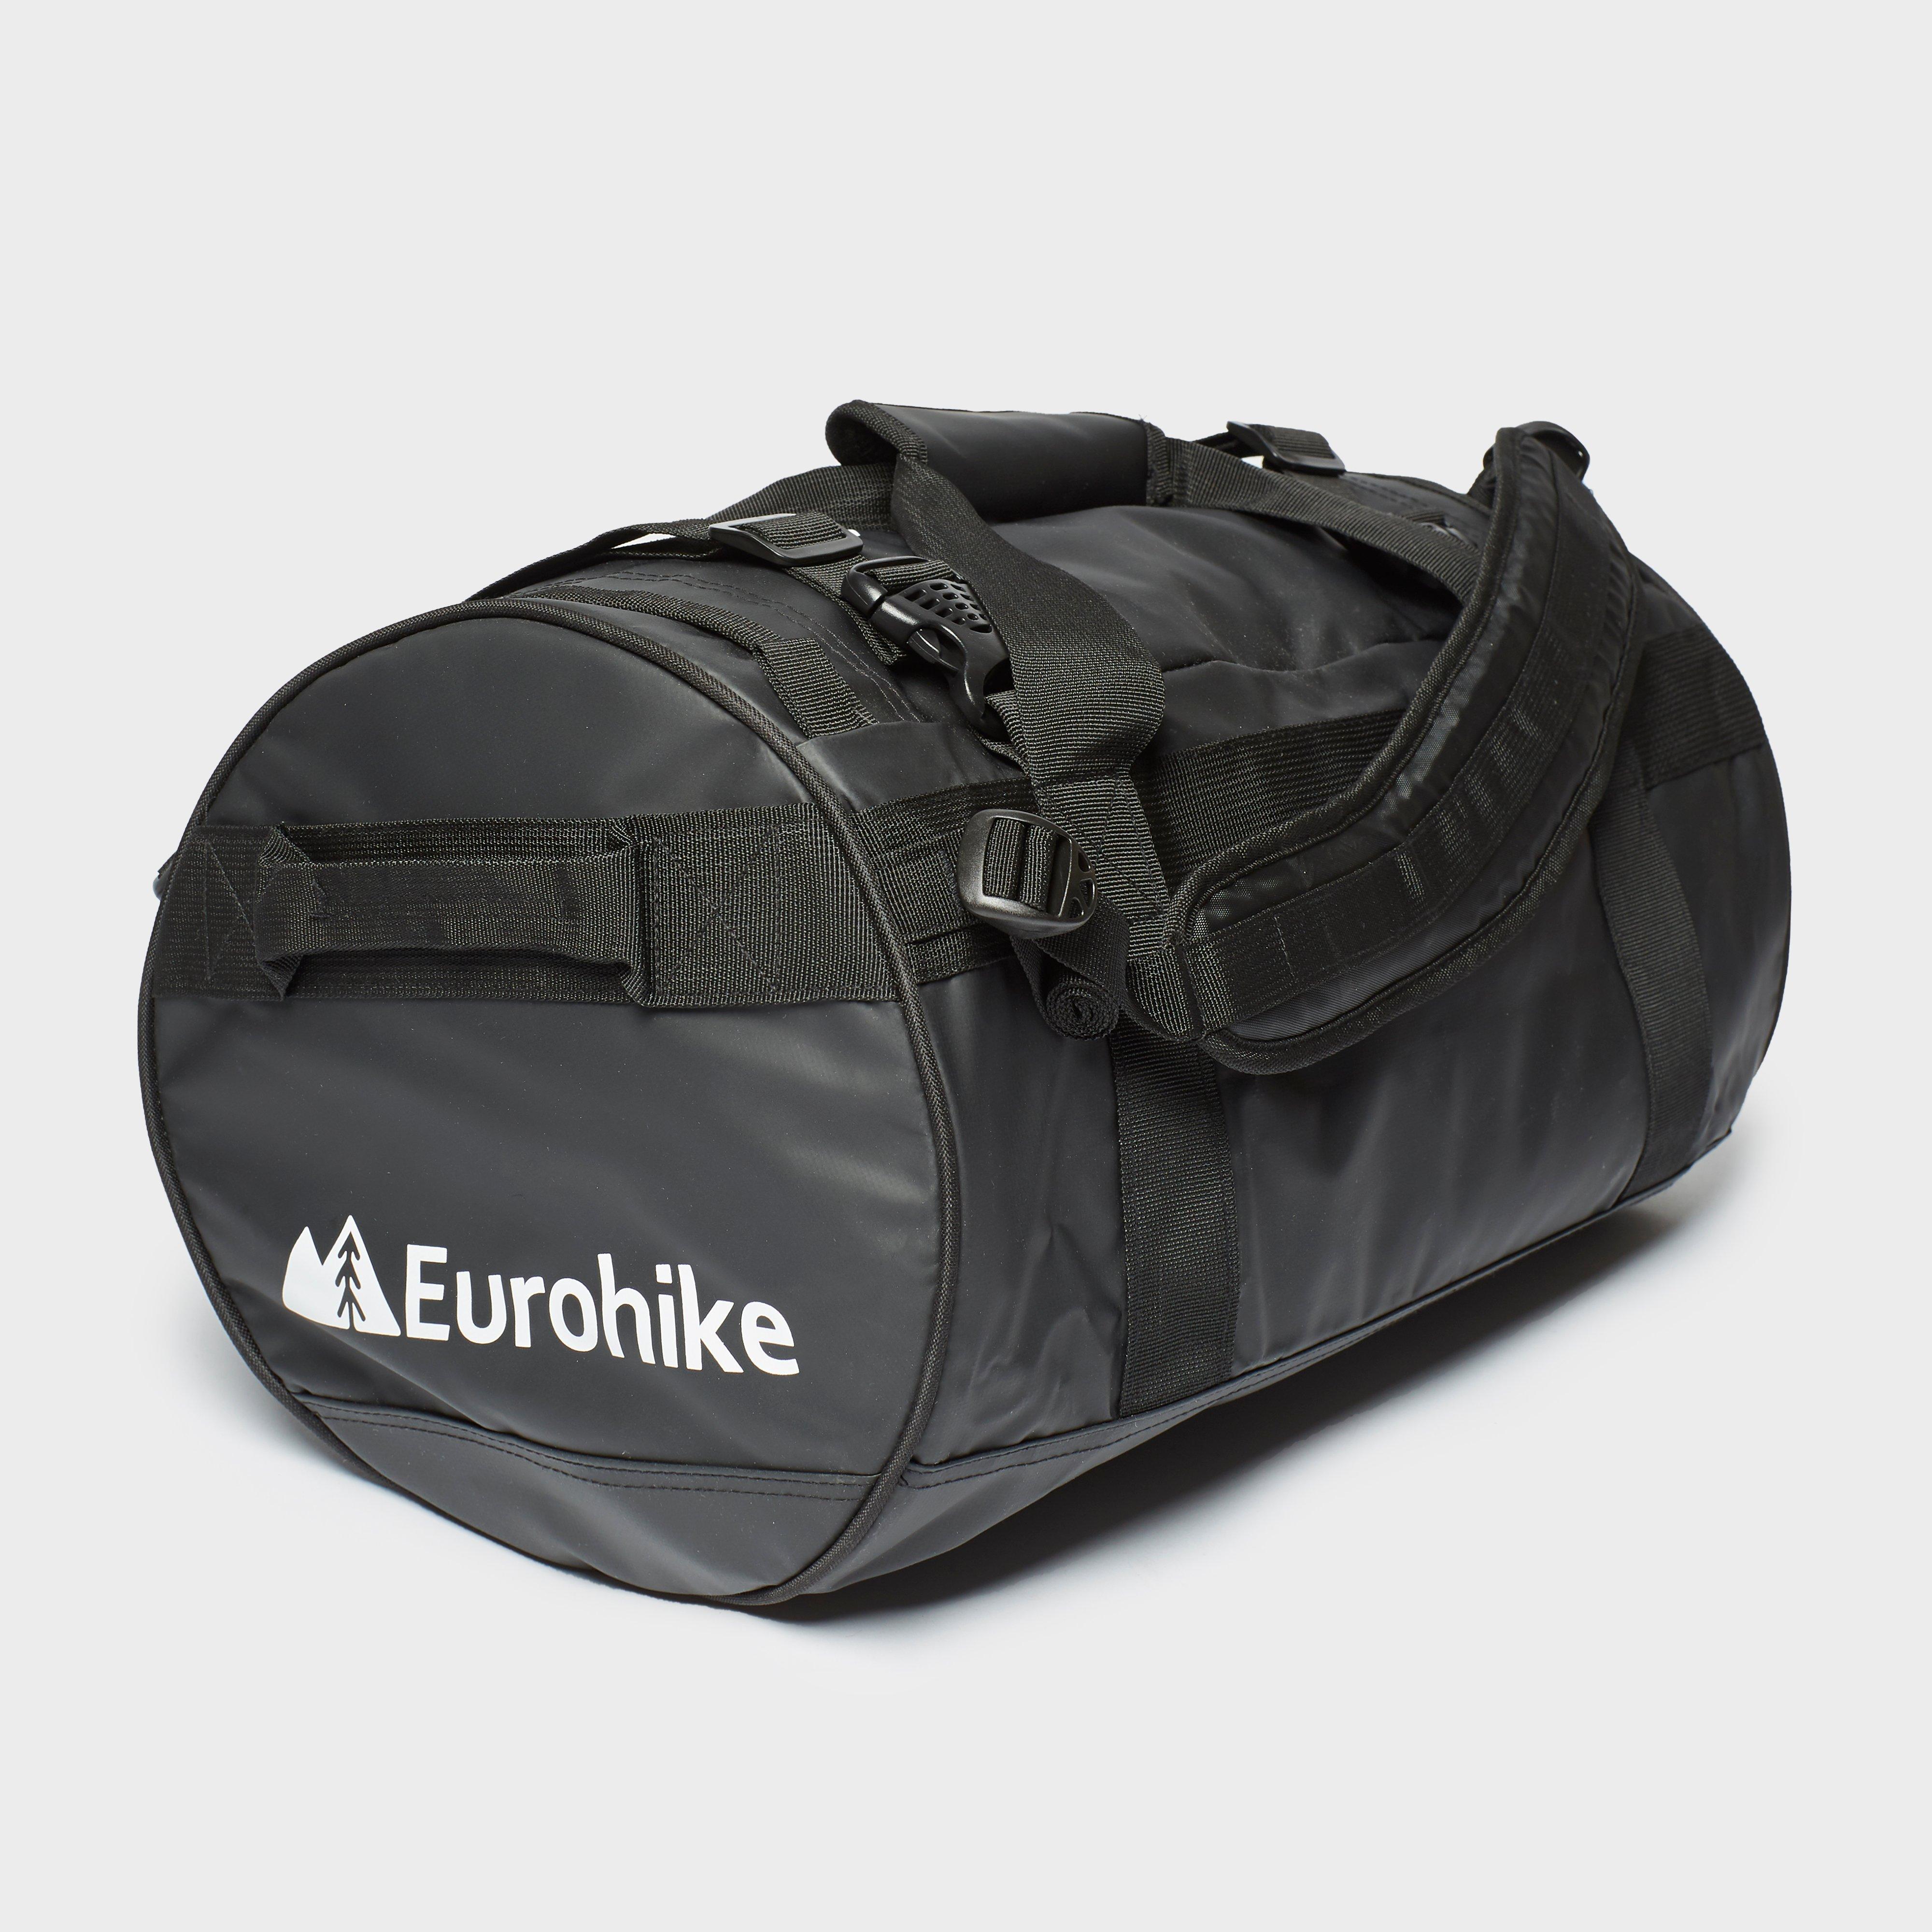 Eurohike Eurohike Transit 40 Hybrid Duffel Bag - Black, Black